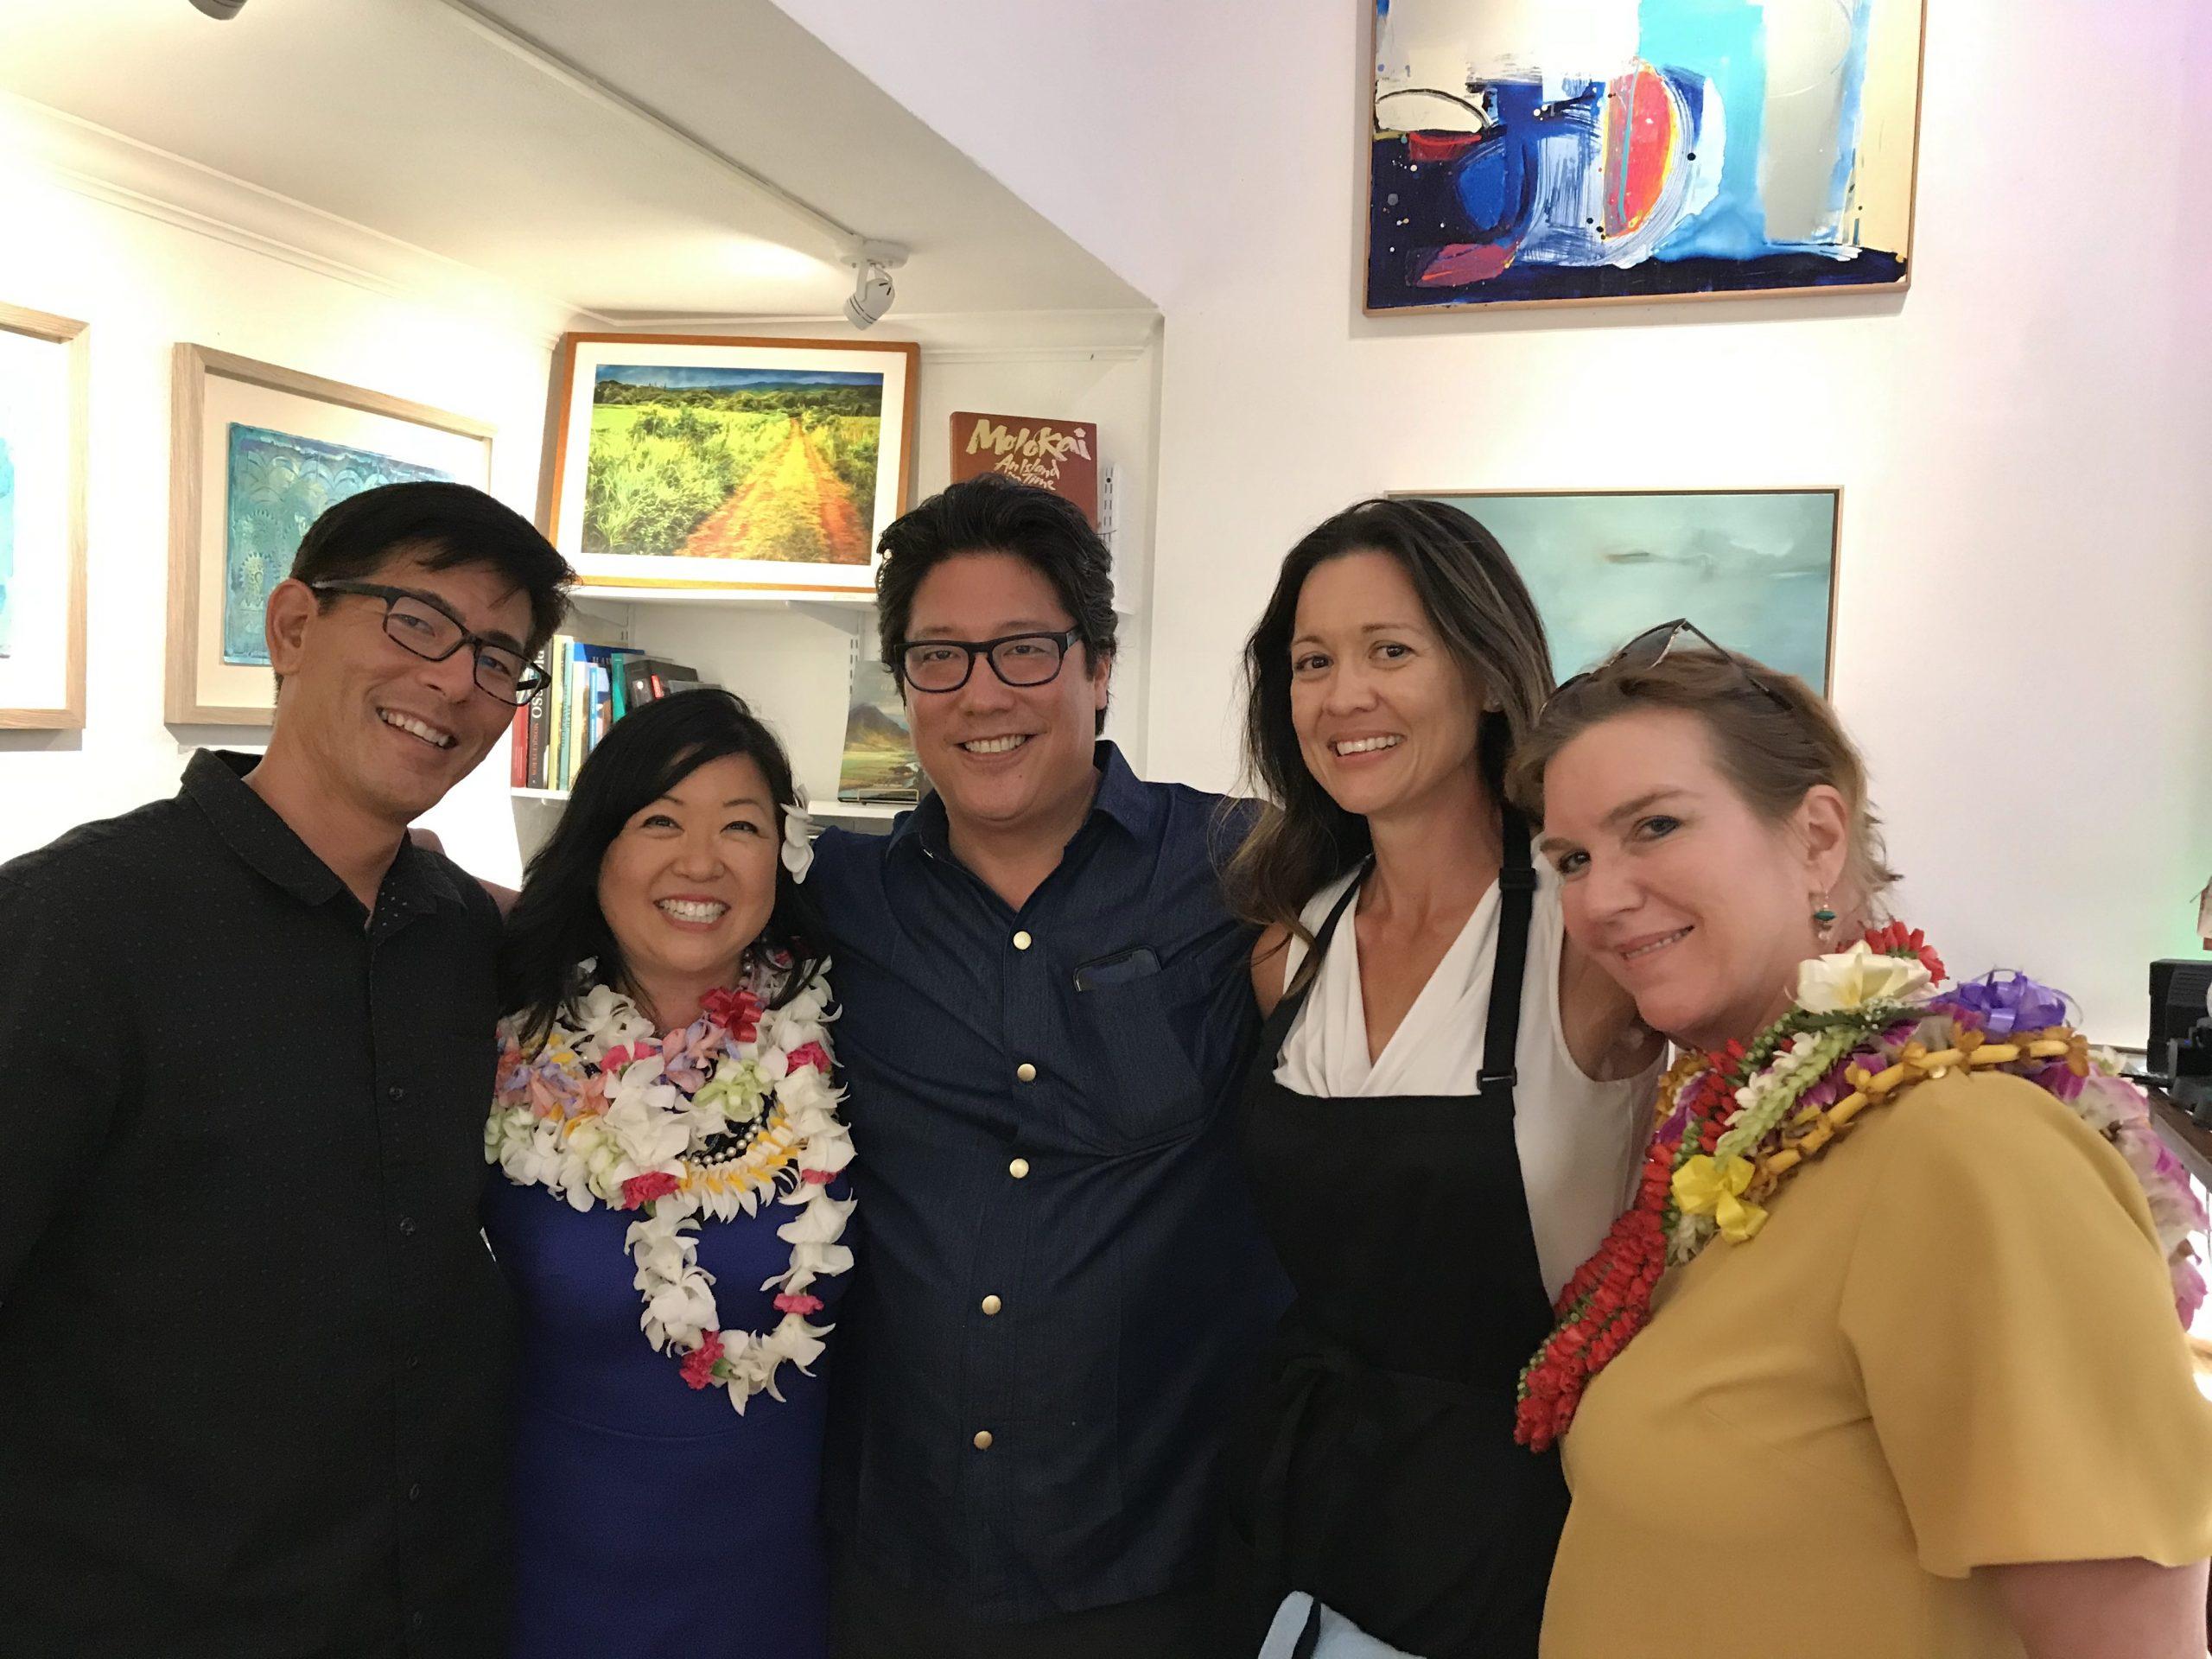 Jan Tetsutani, Chef Jon Matsubara his wife Jamie & Cathy Cooke